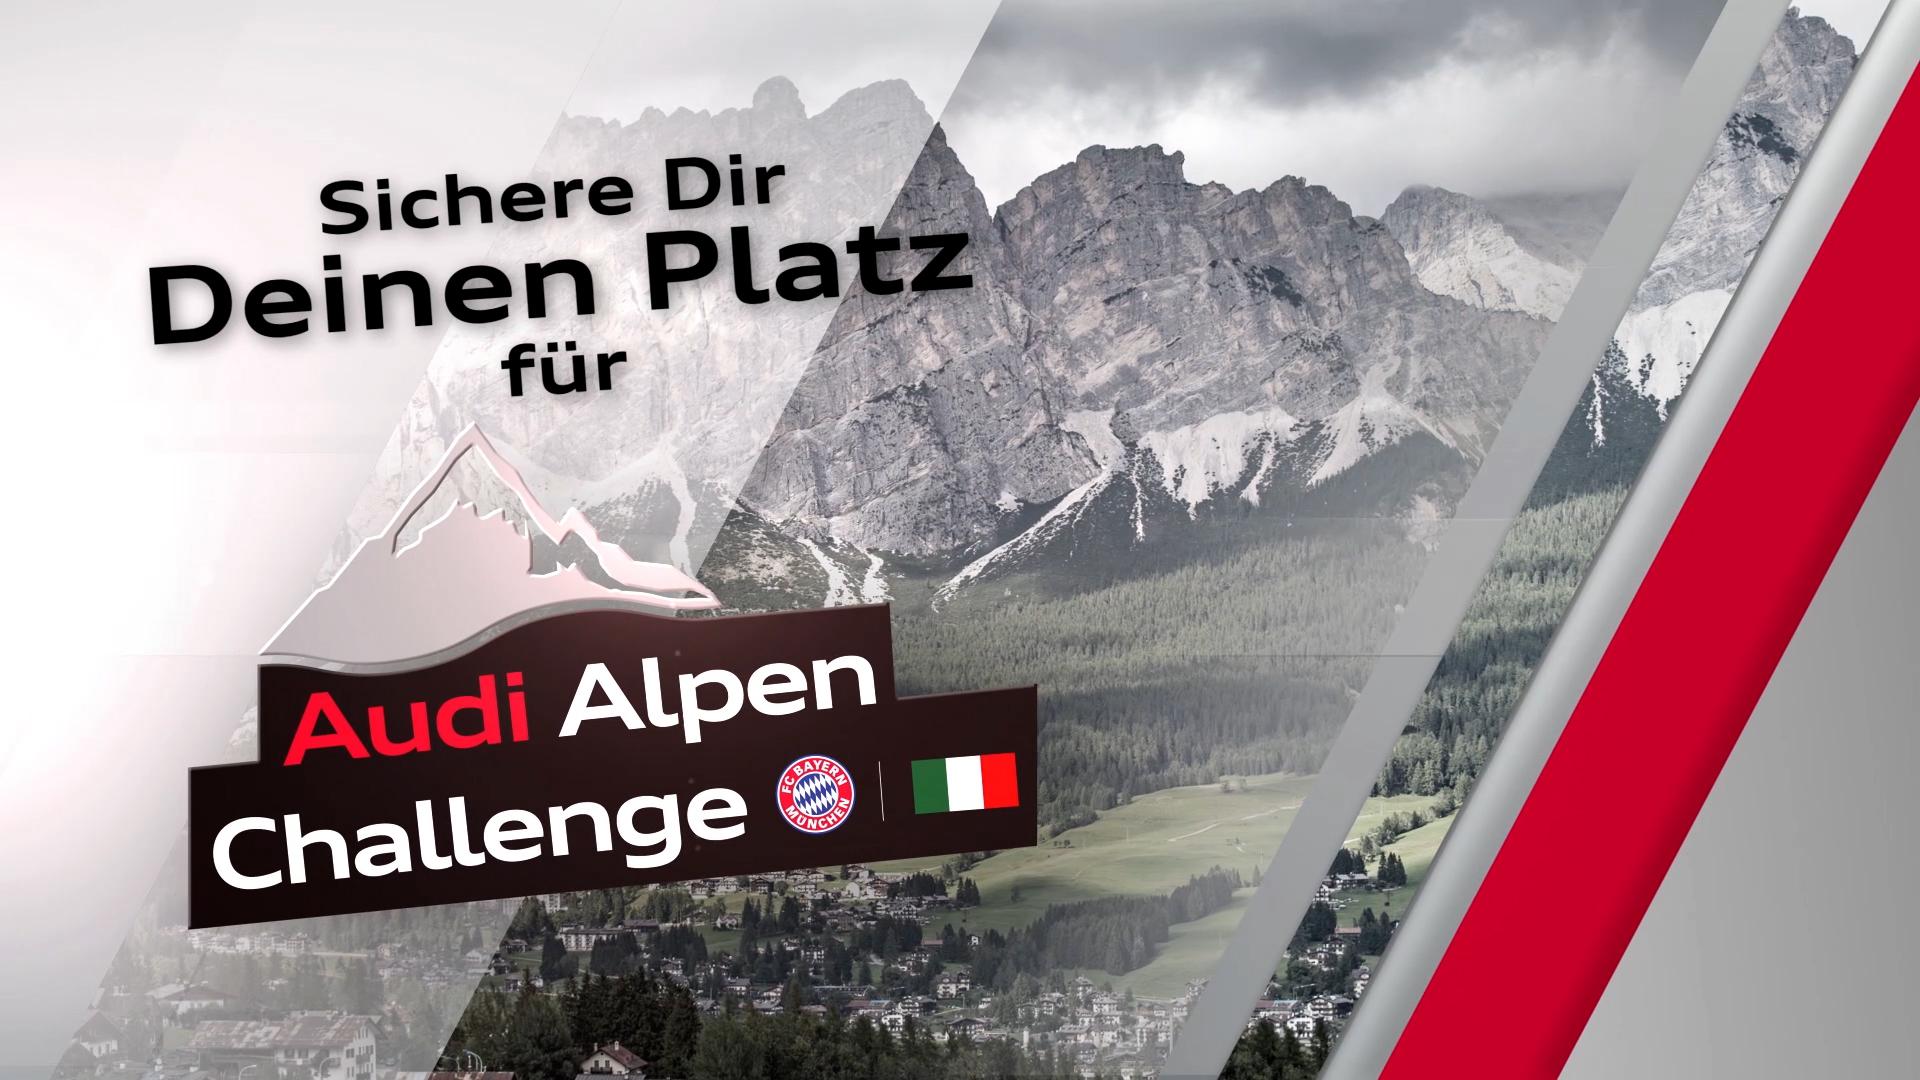 Audi Alpen Challenge Werbespot